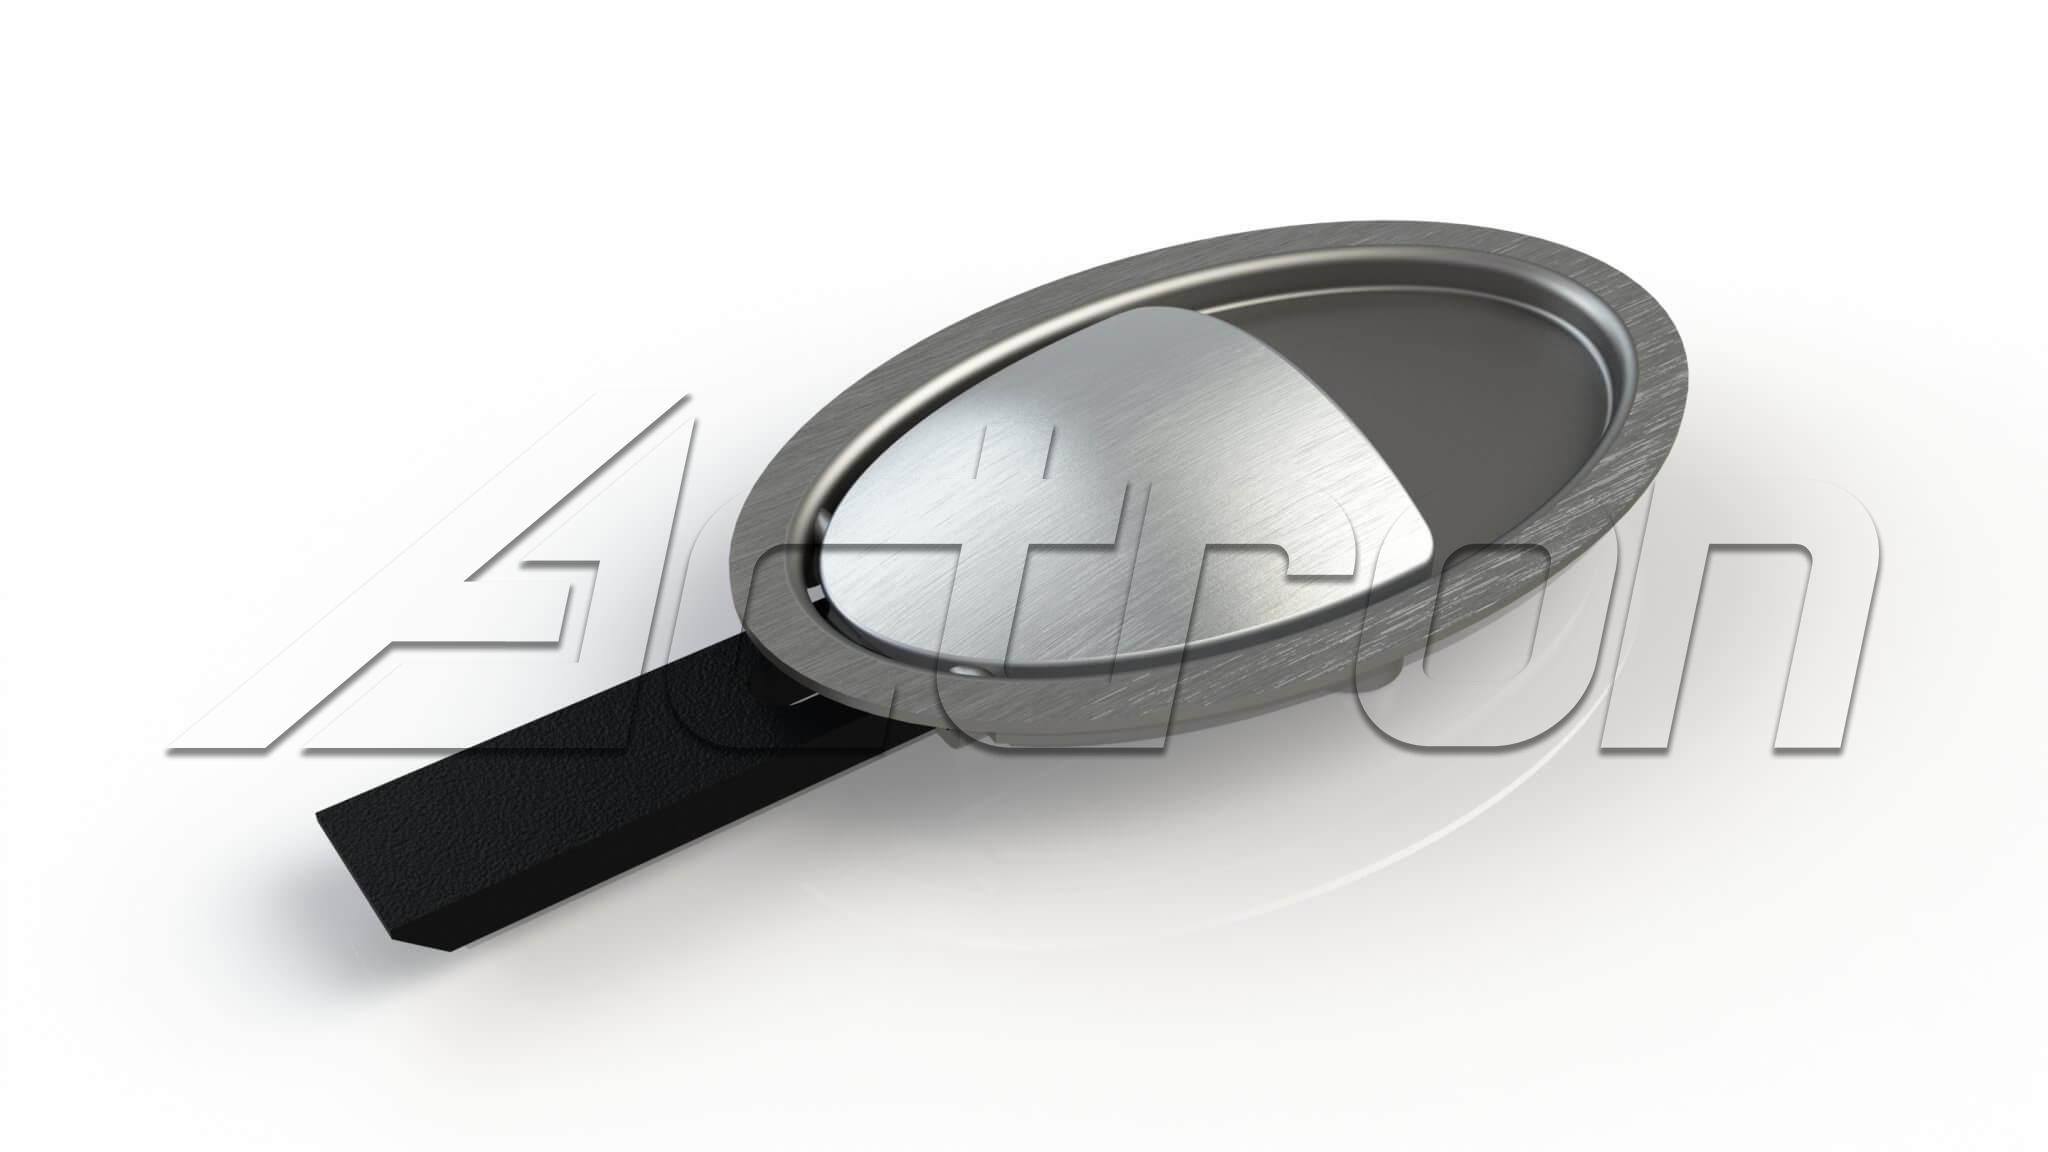 latch-assy-8211-paddle-3914-a23310.jpg